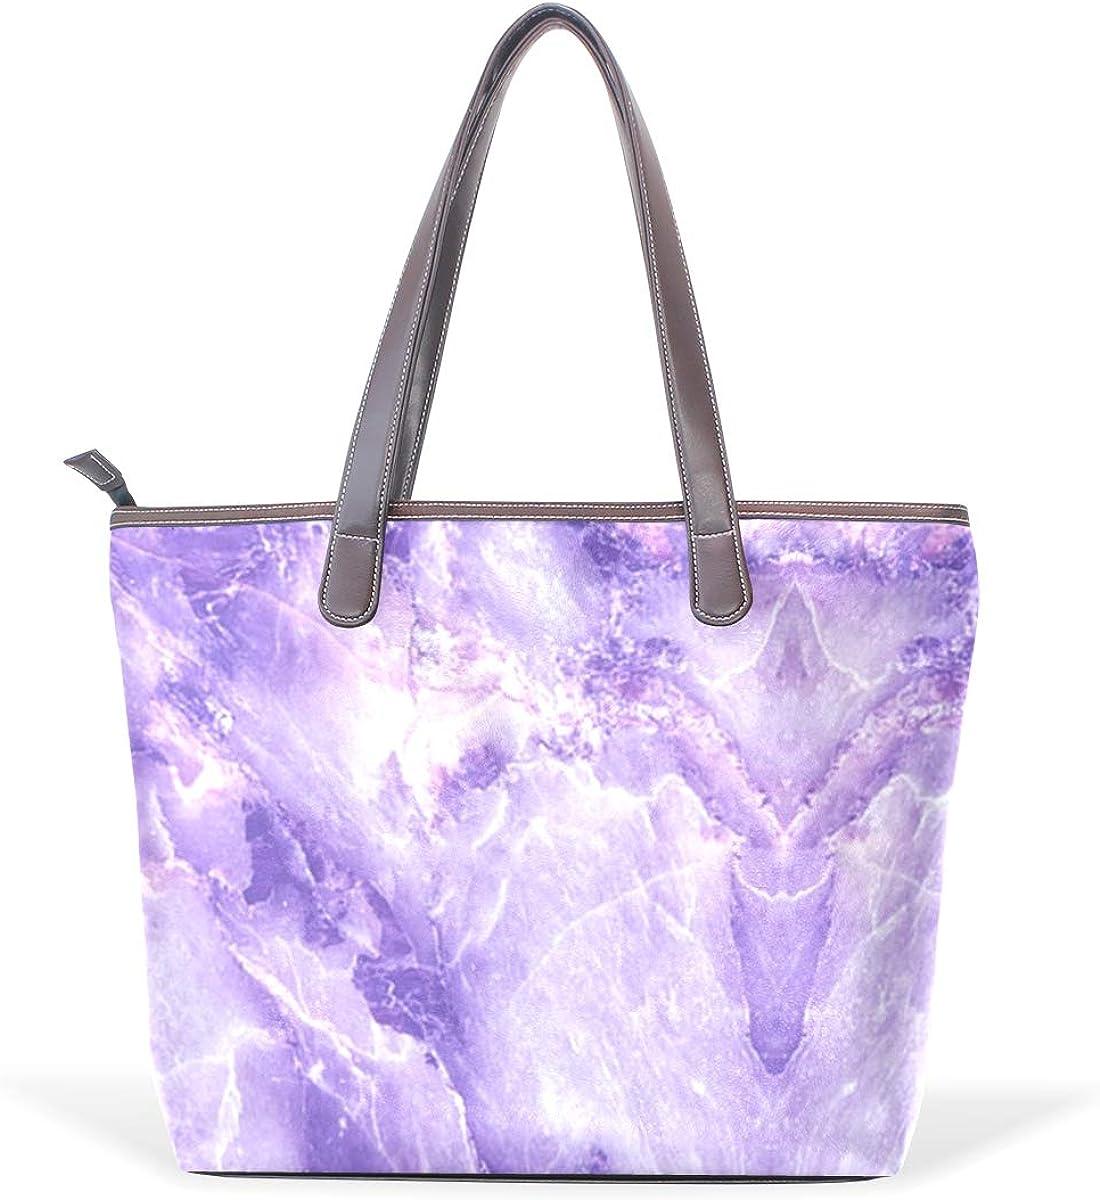 Purple MarbleWomens Vintage Leather Tote Urban Style Satchel Tote